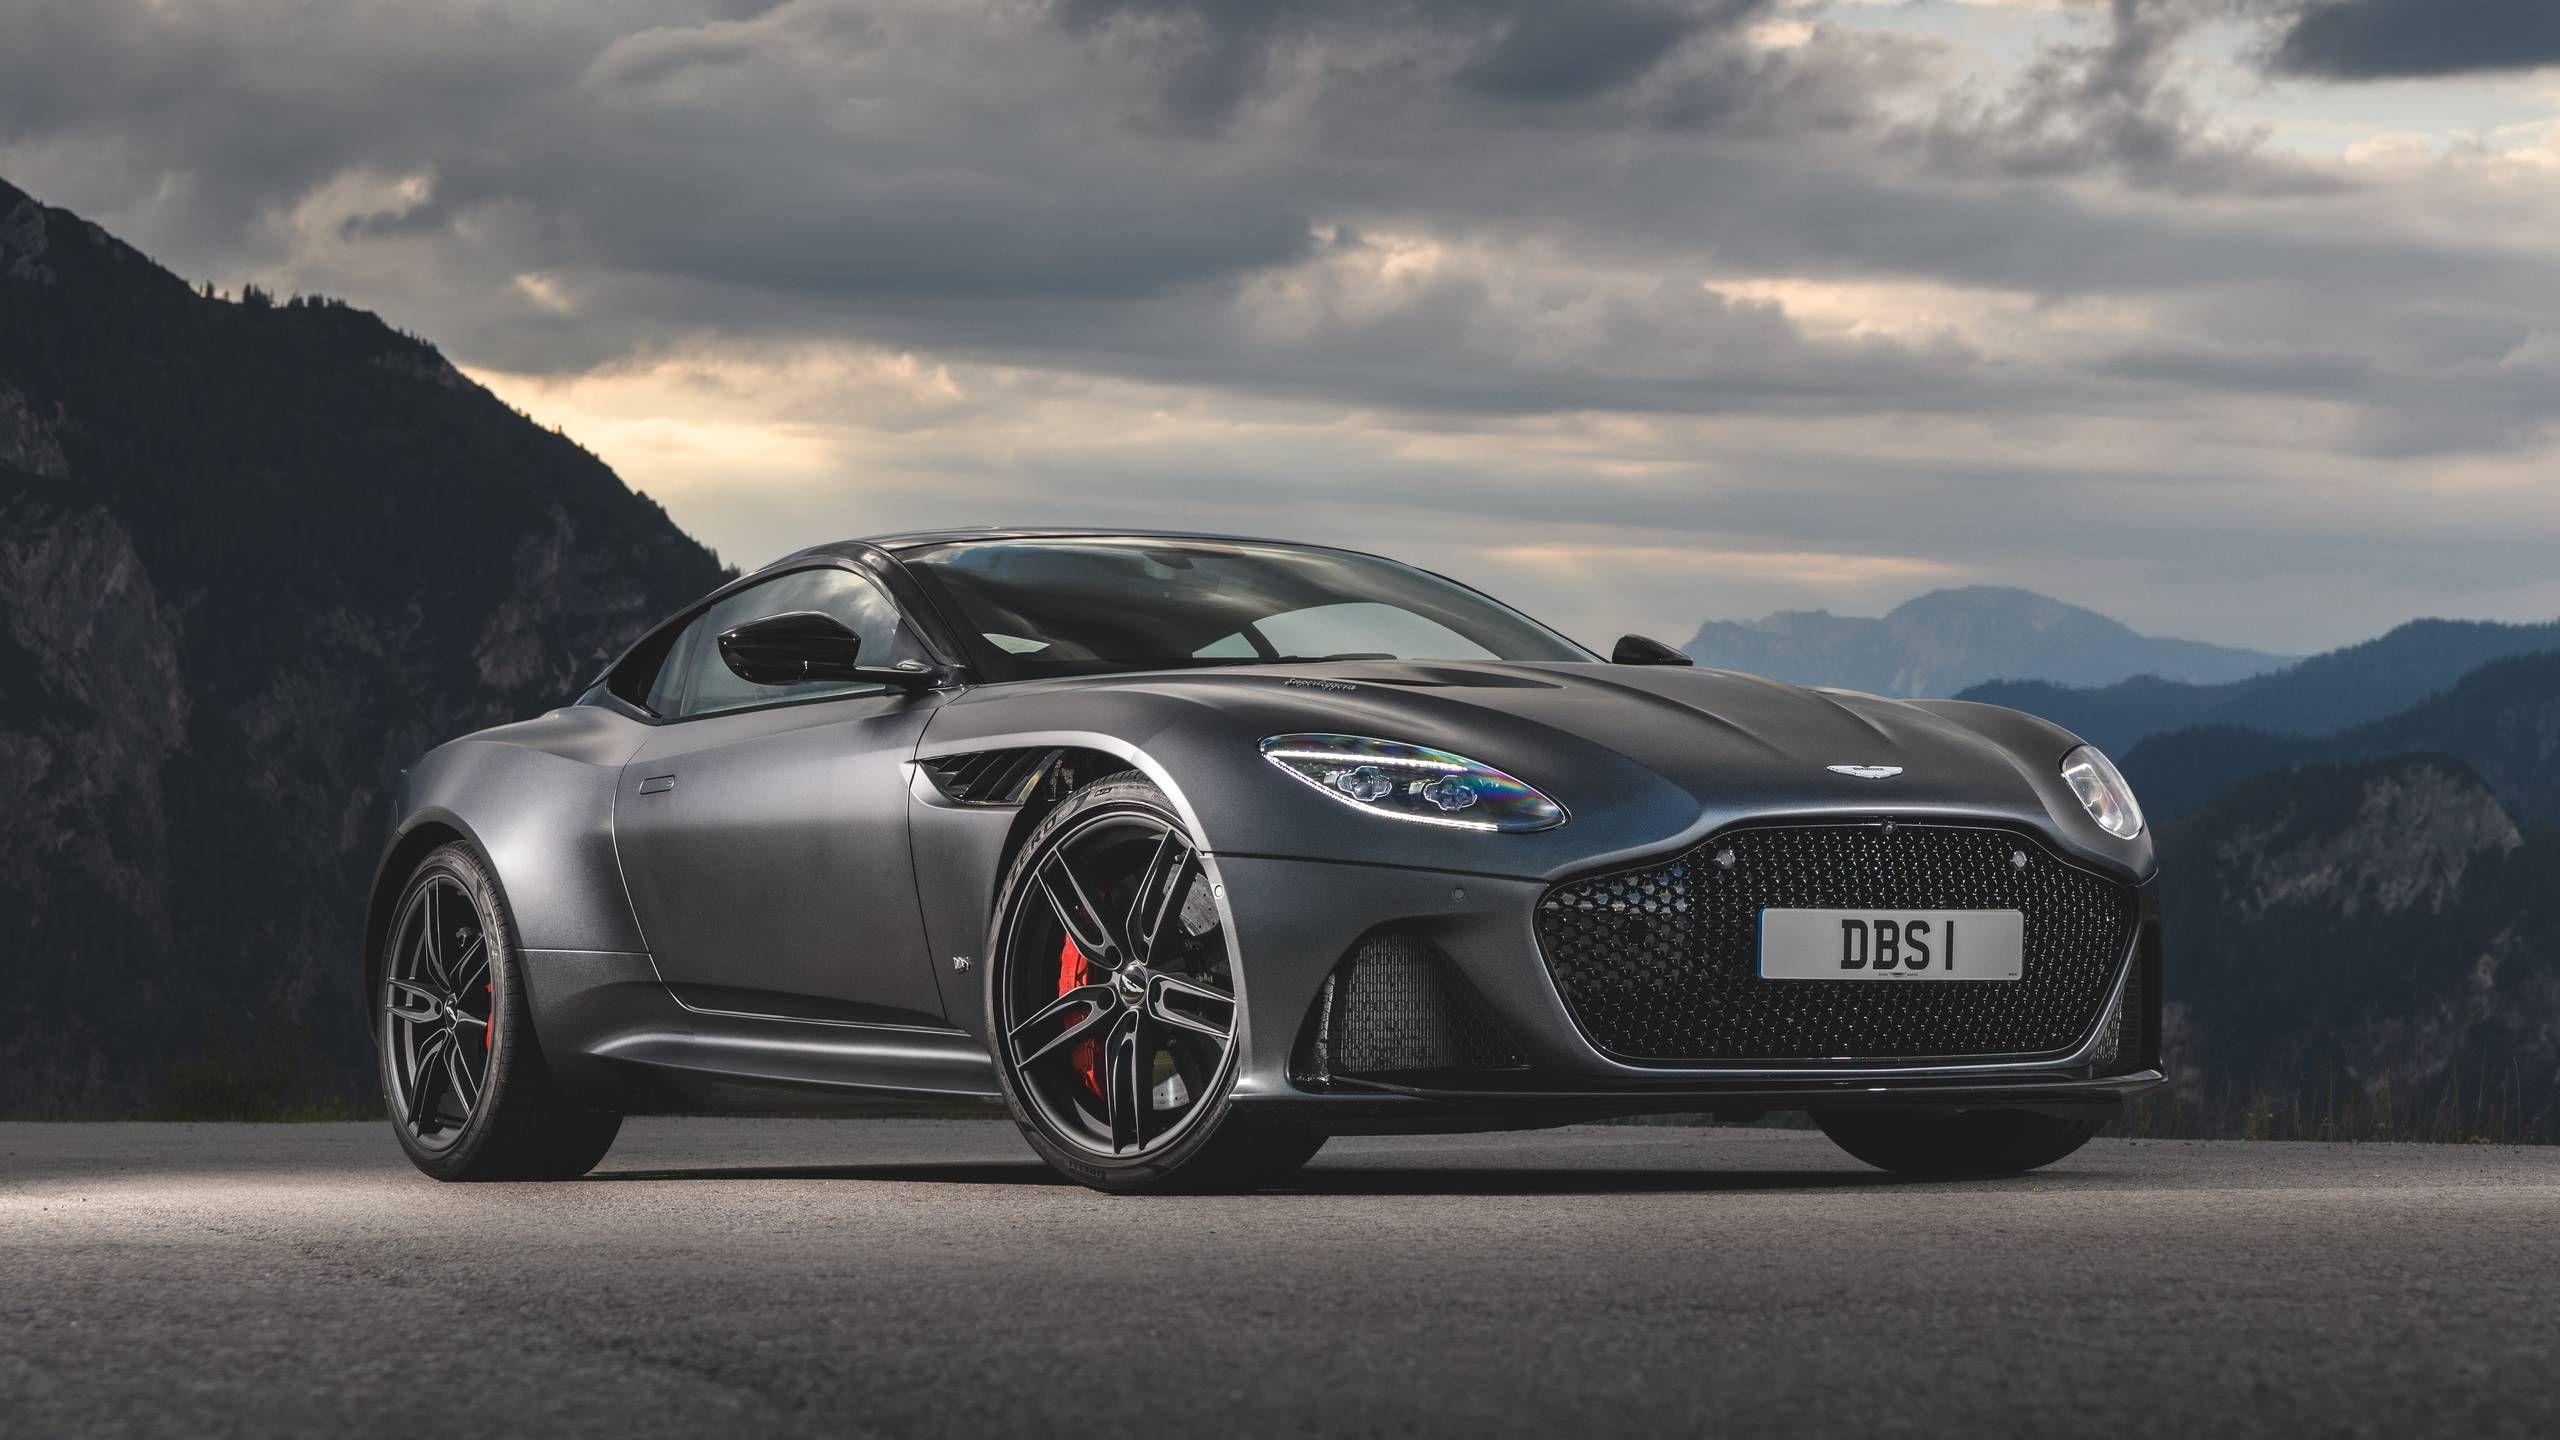 2019 Aston Martin Dbs Superleggera First Drive The Brute In A Suit